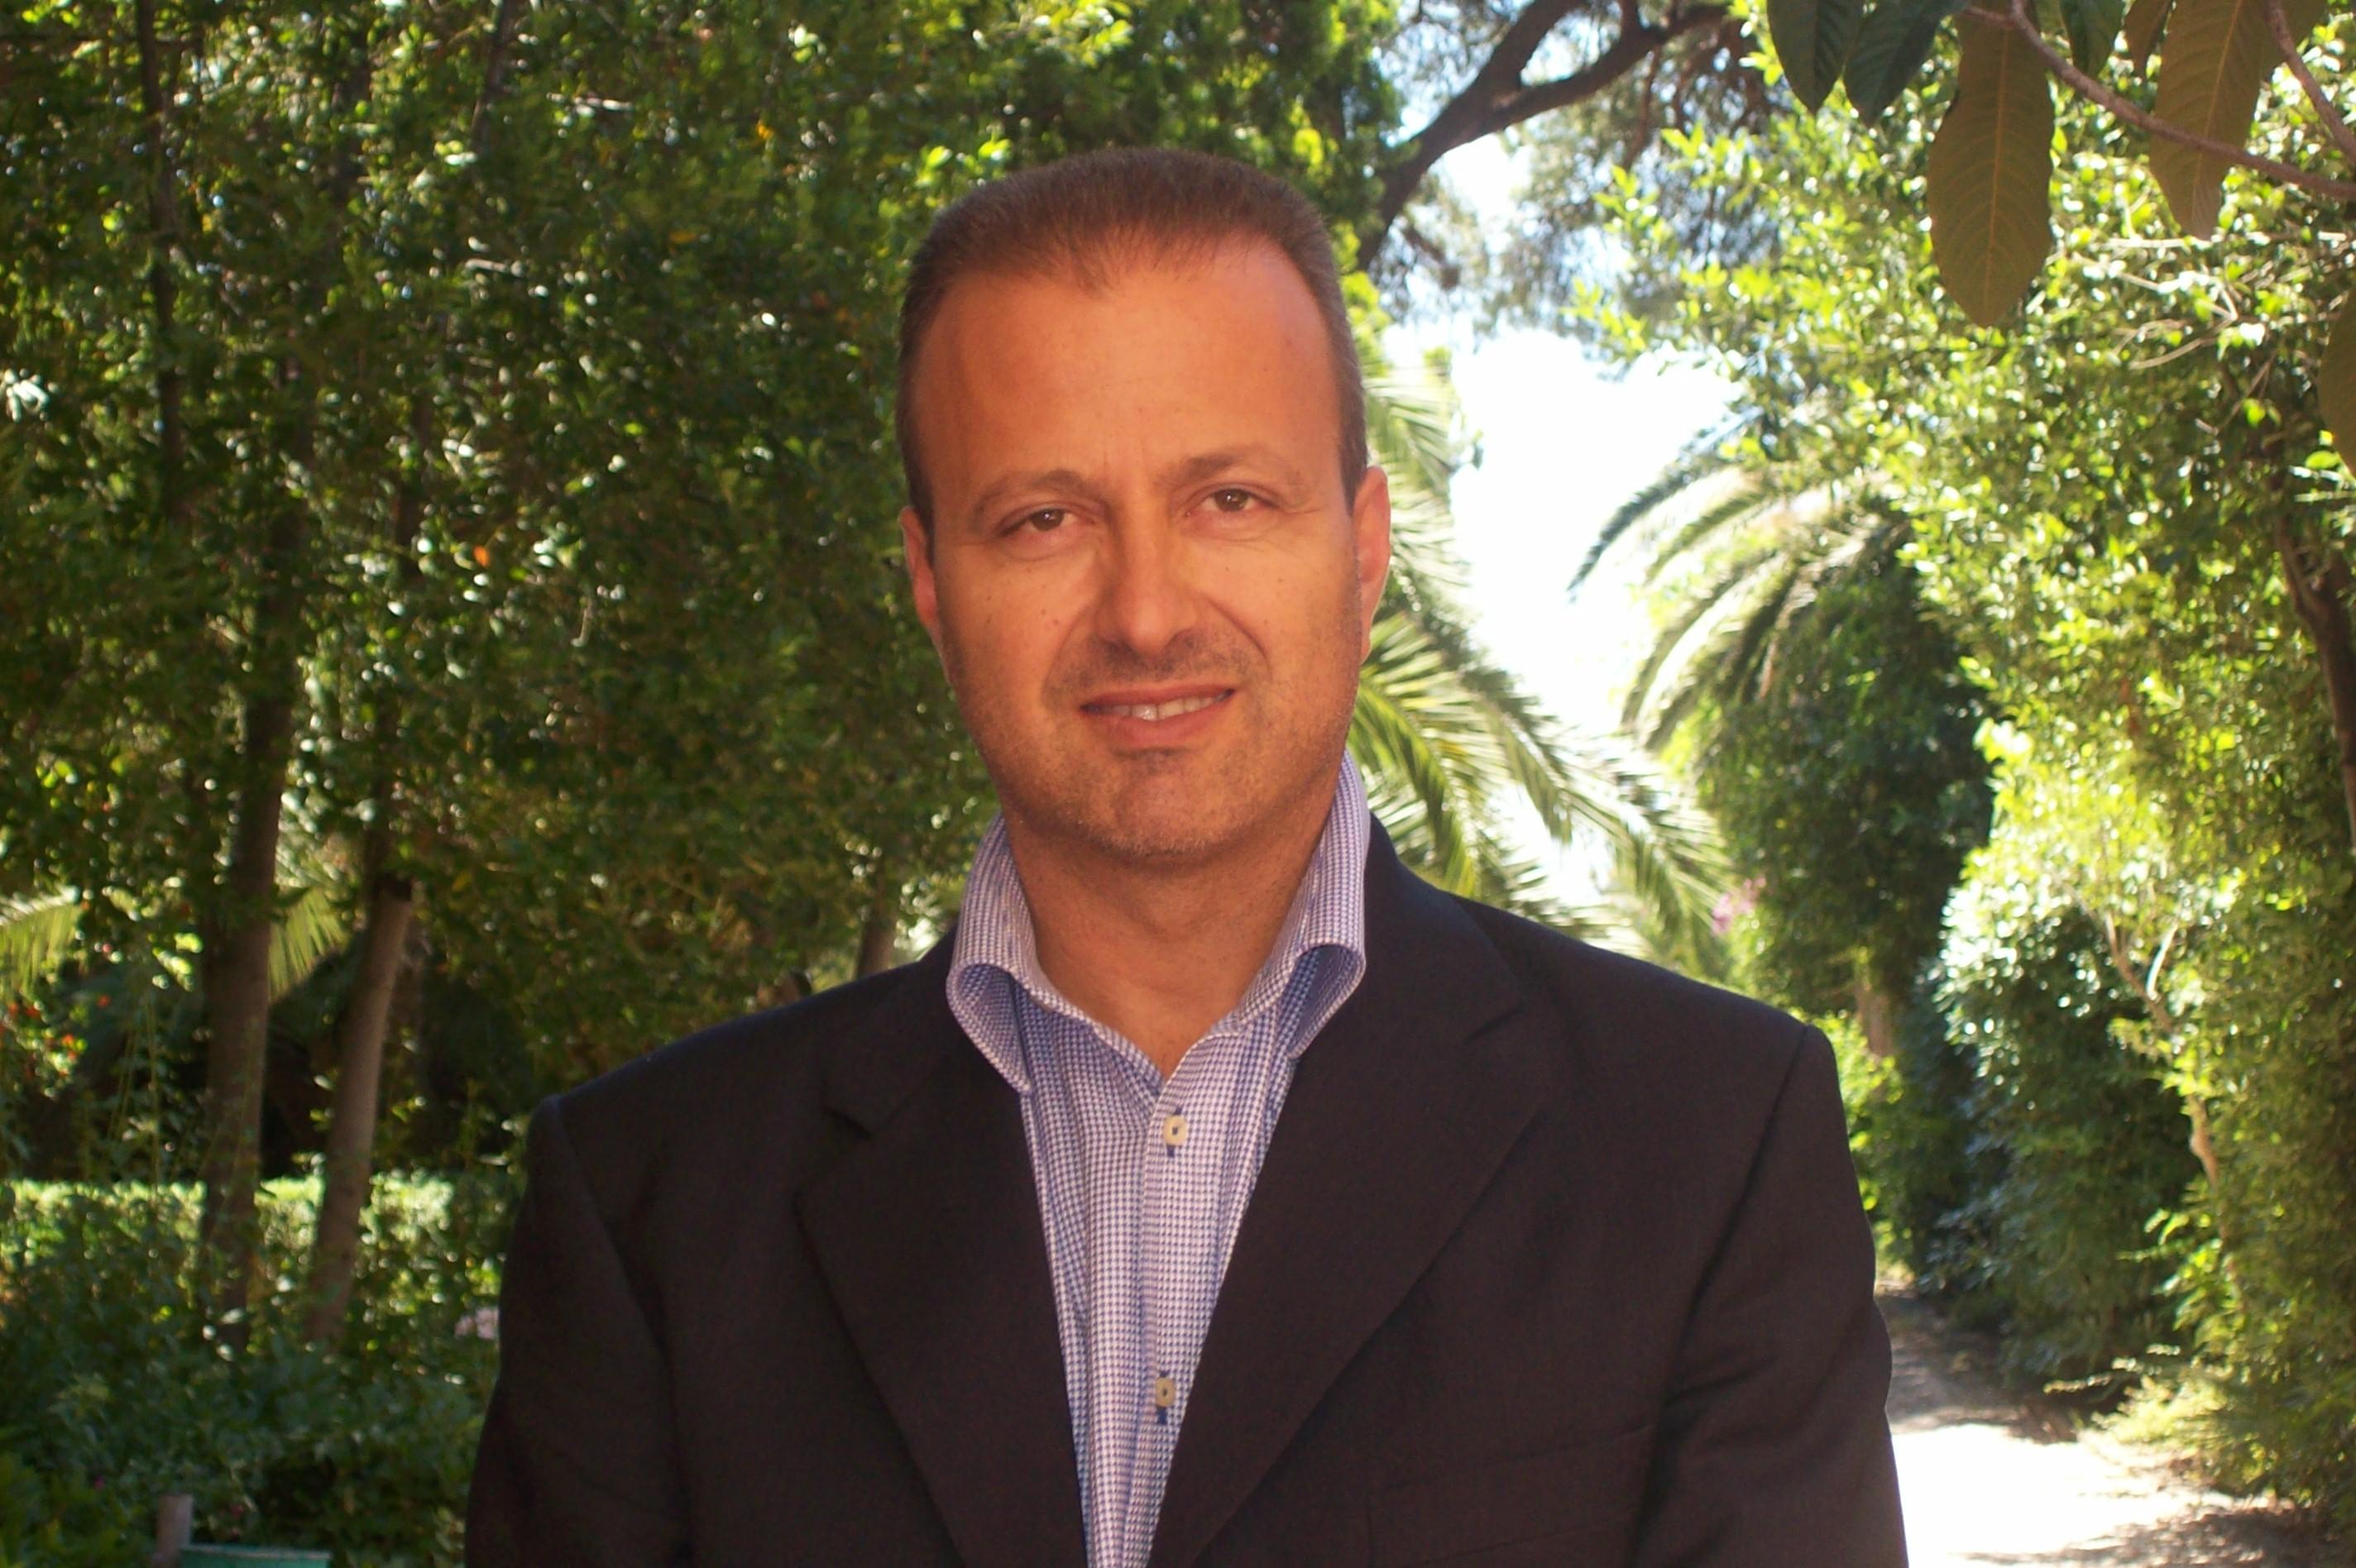 Roberto Marongiu